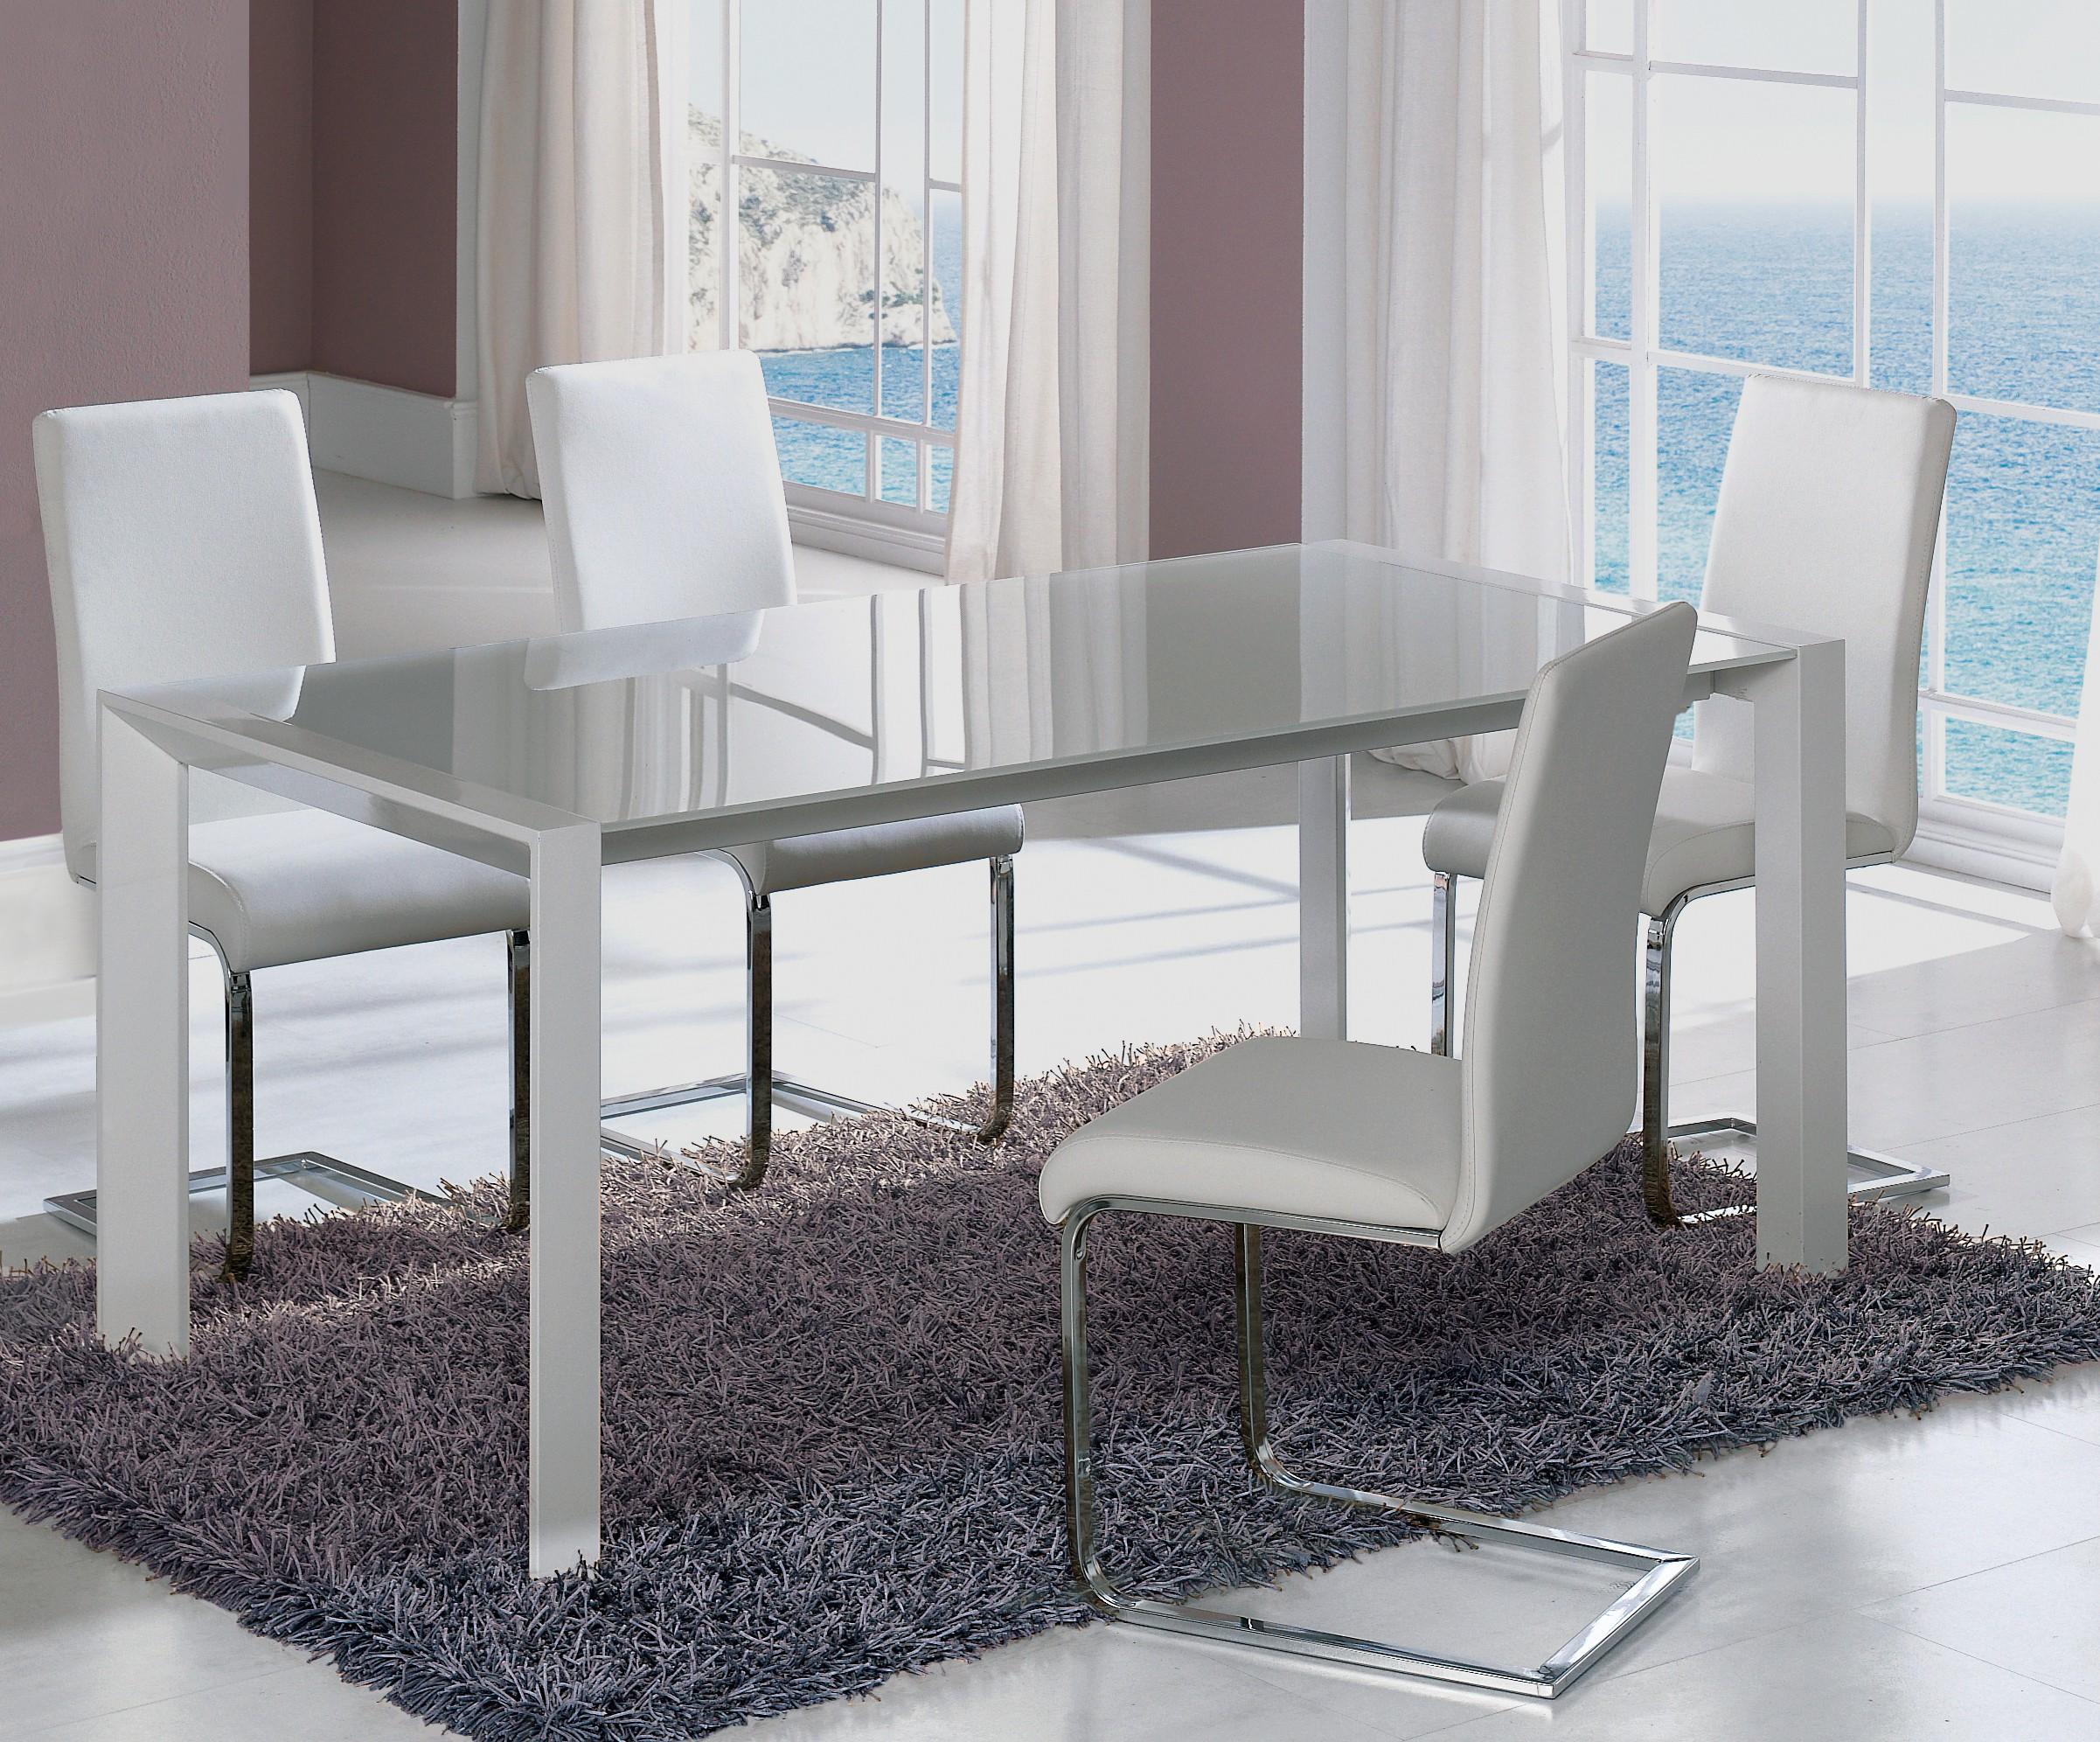 table extensible design m tal blanc et verre tremp blanc perla 140. Black Bedroom Furniture Sets. Home Design Ideas